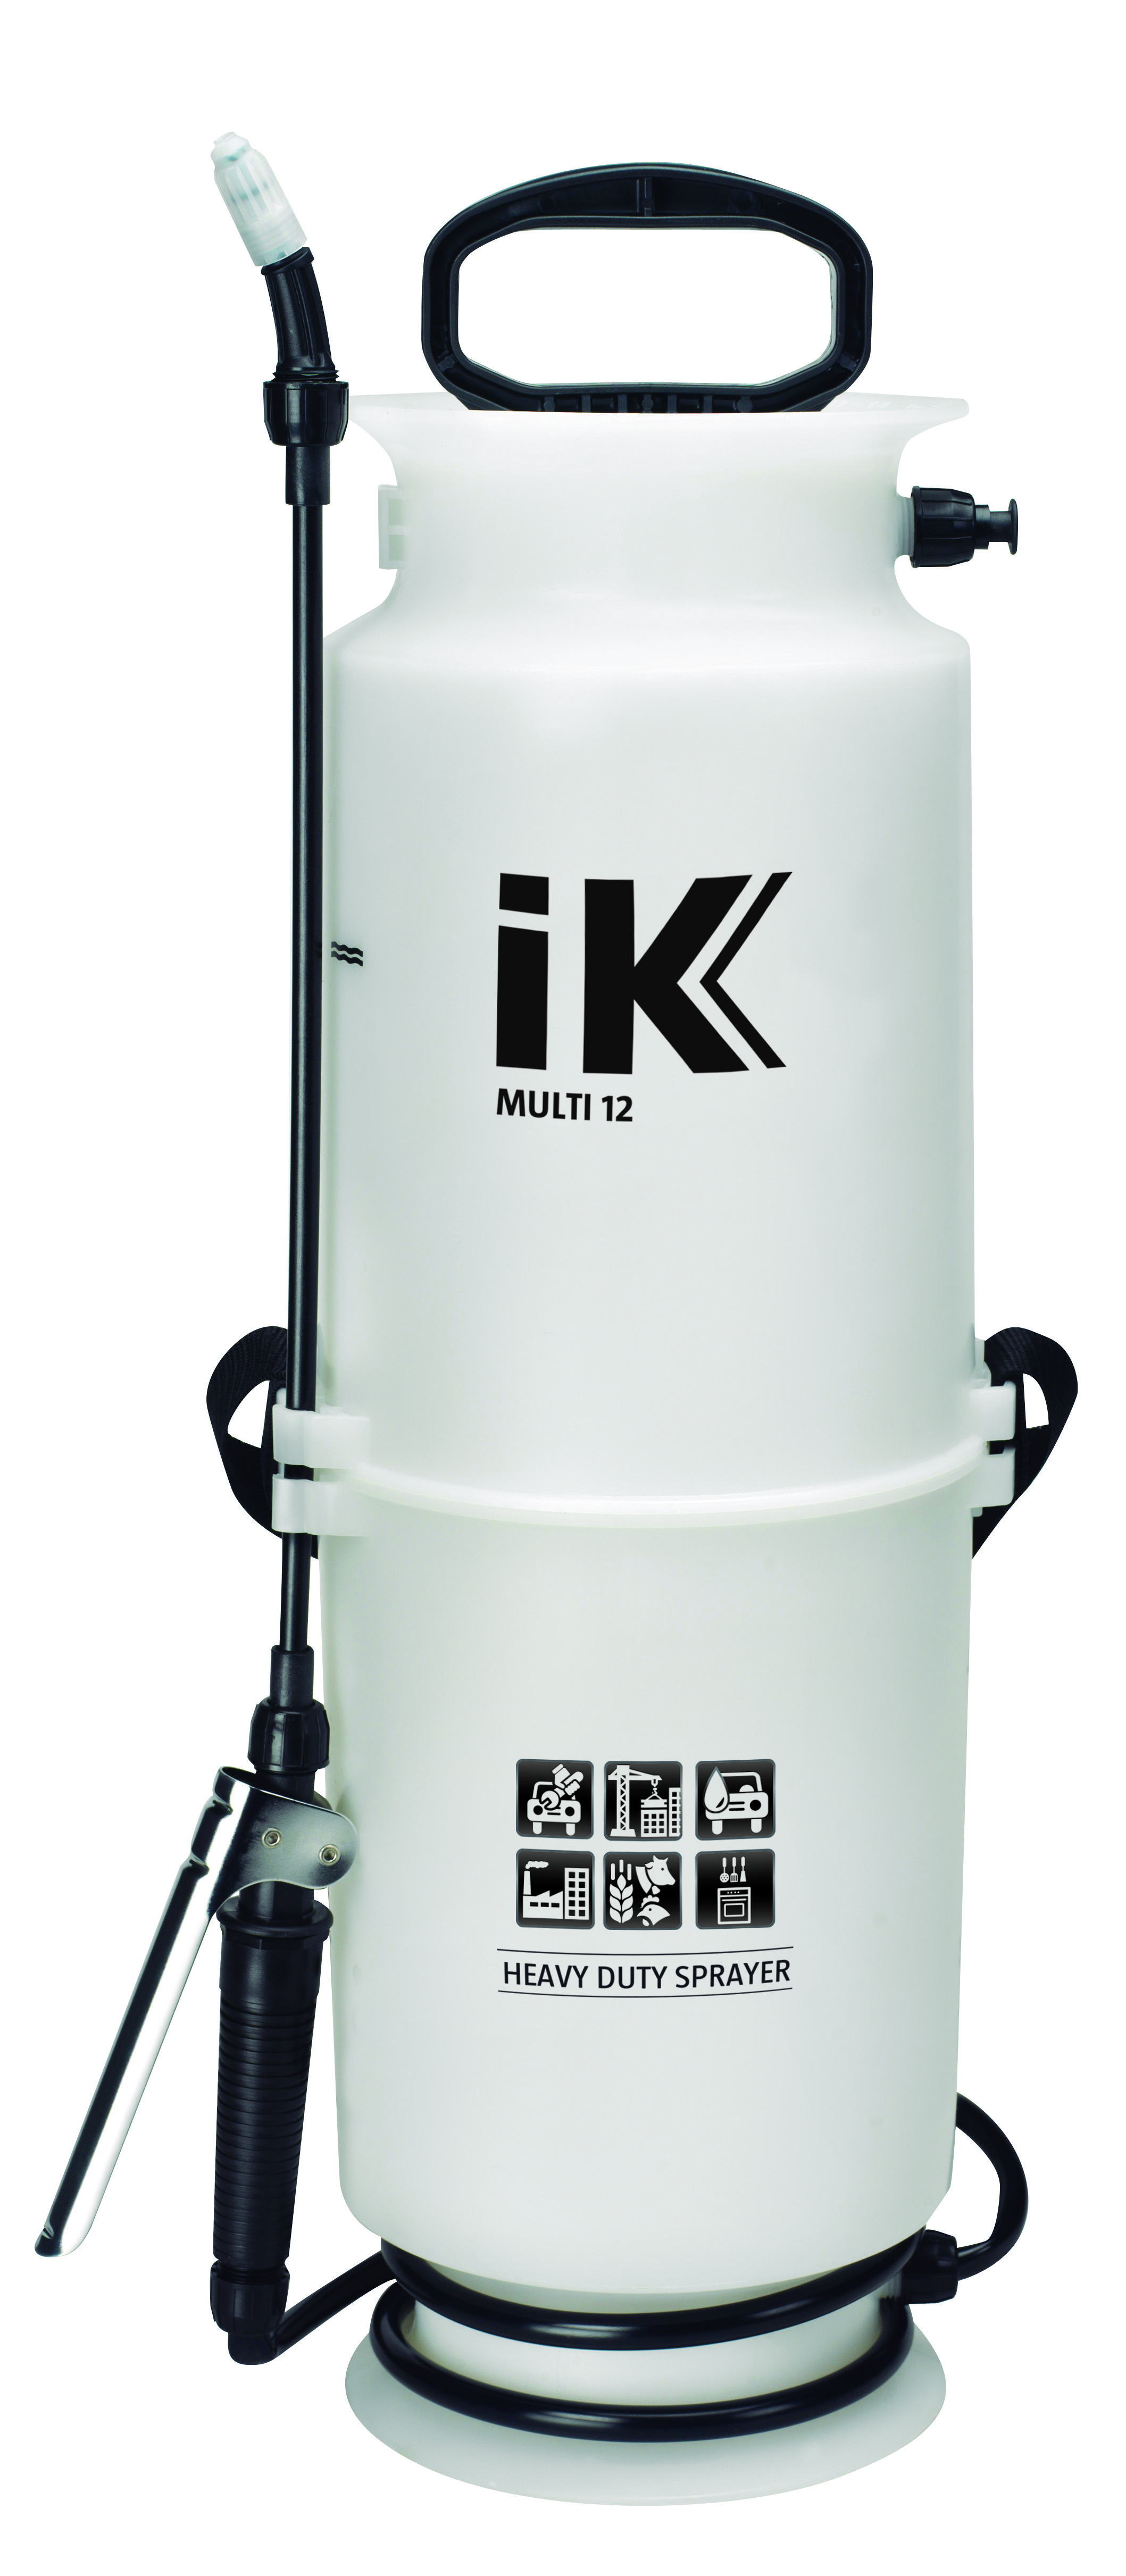 iK12 Goizper sprayer